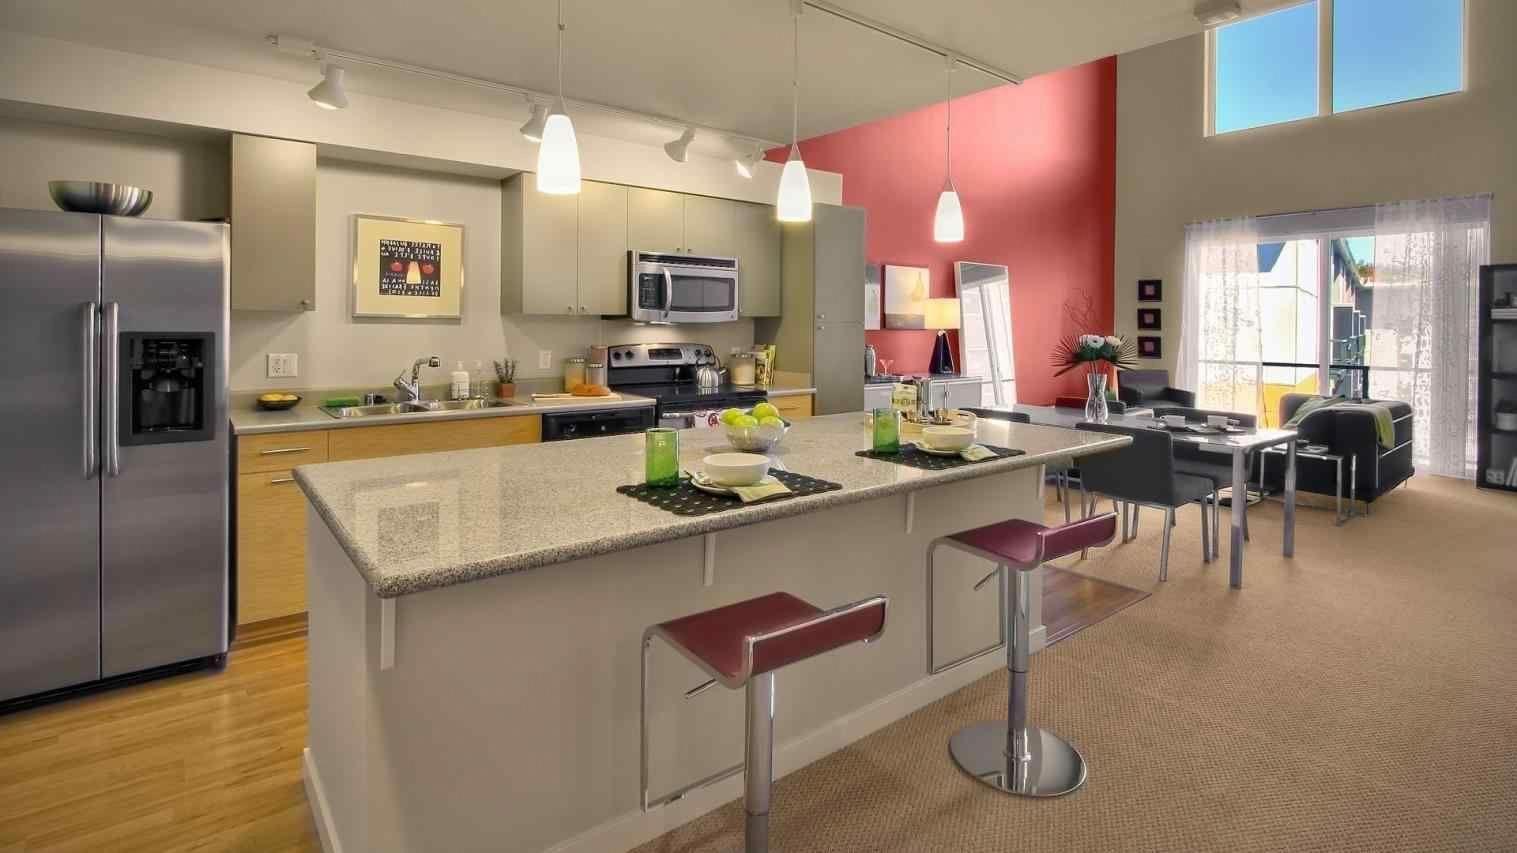 Kitchendecorationpictures kitchen decoration pictures in